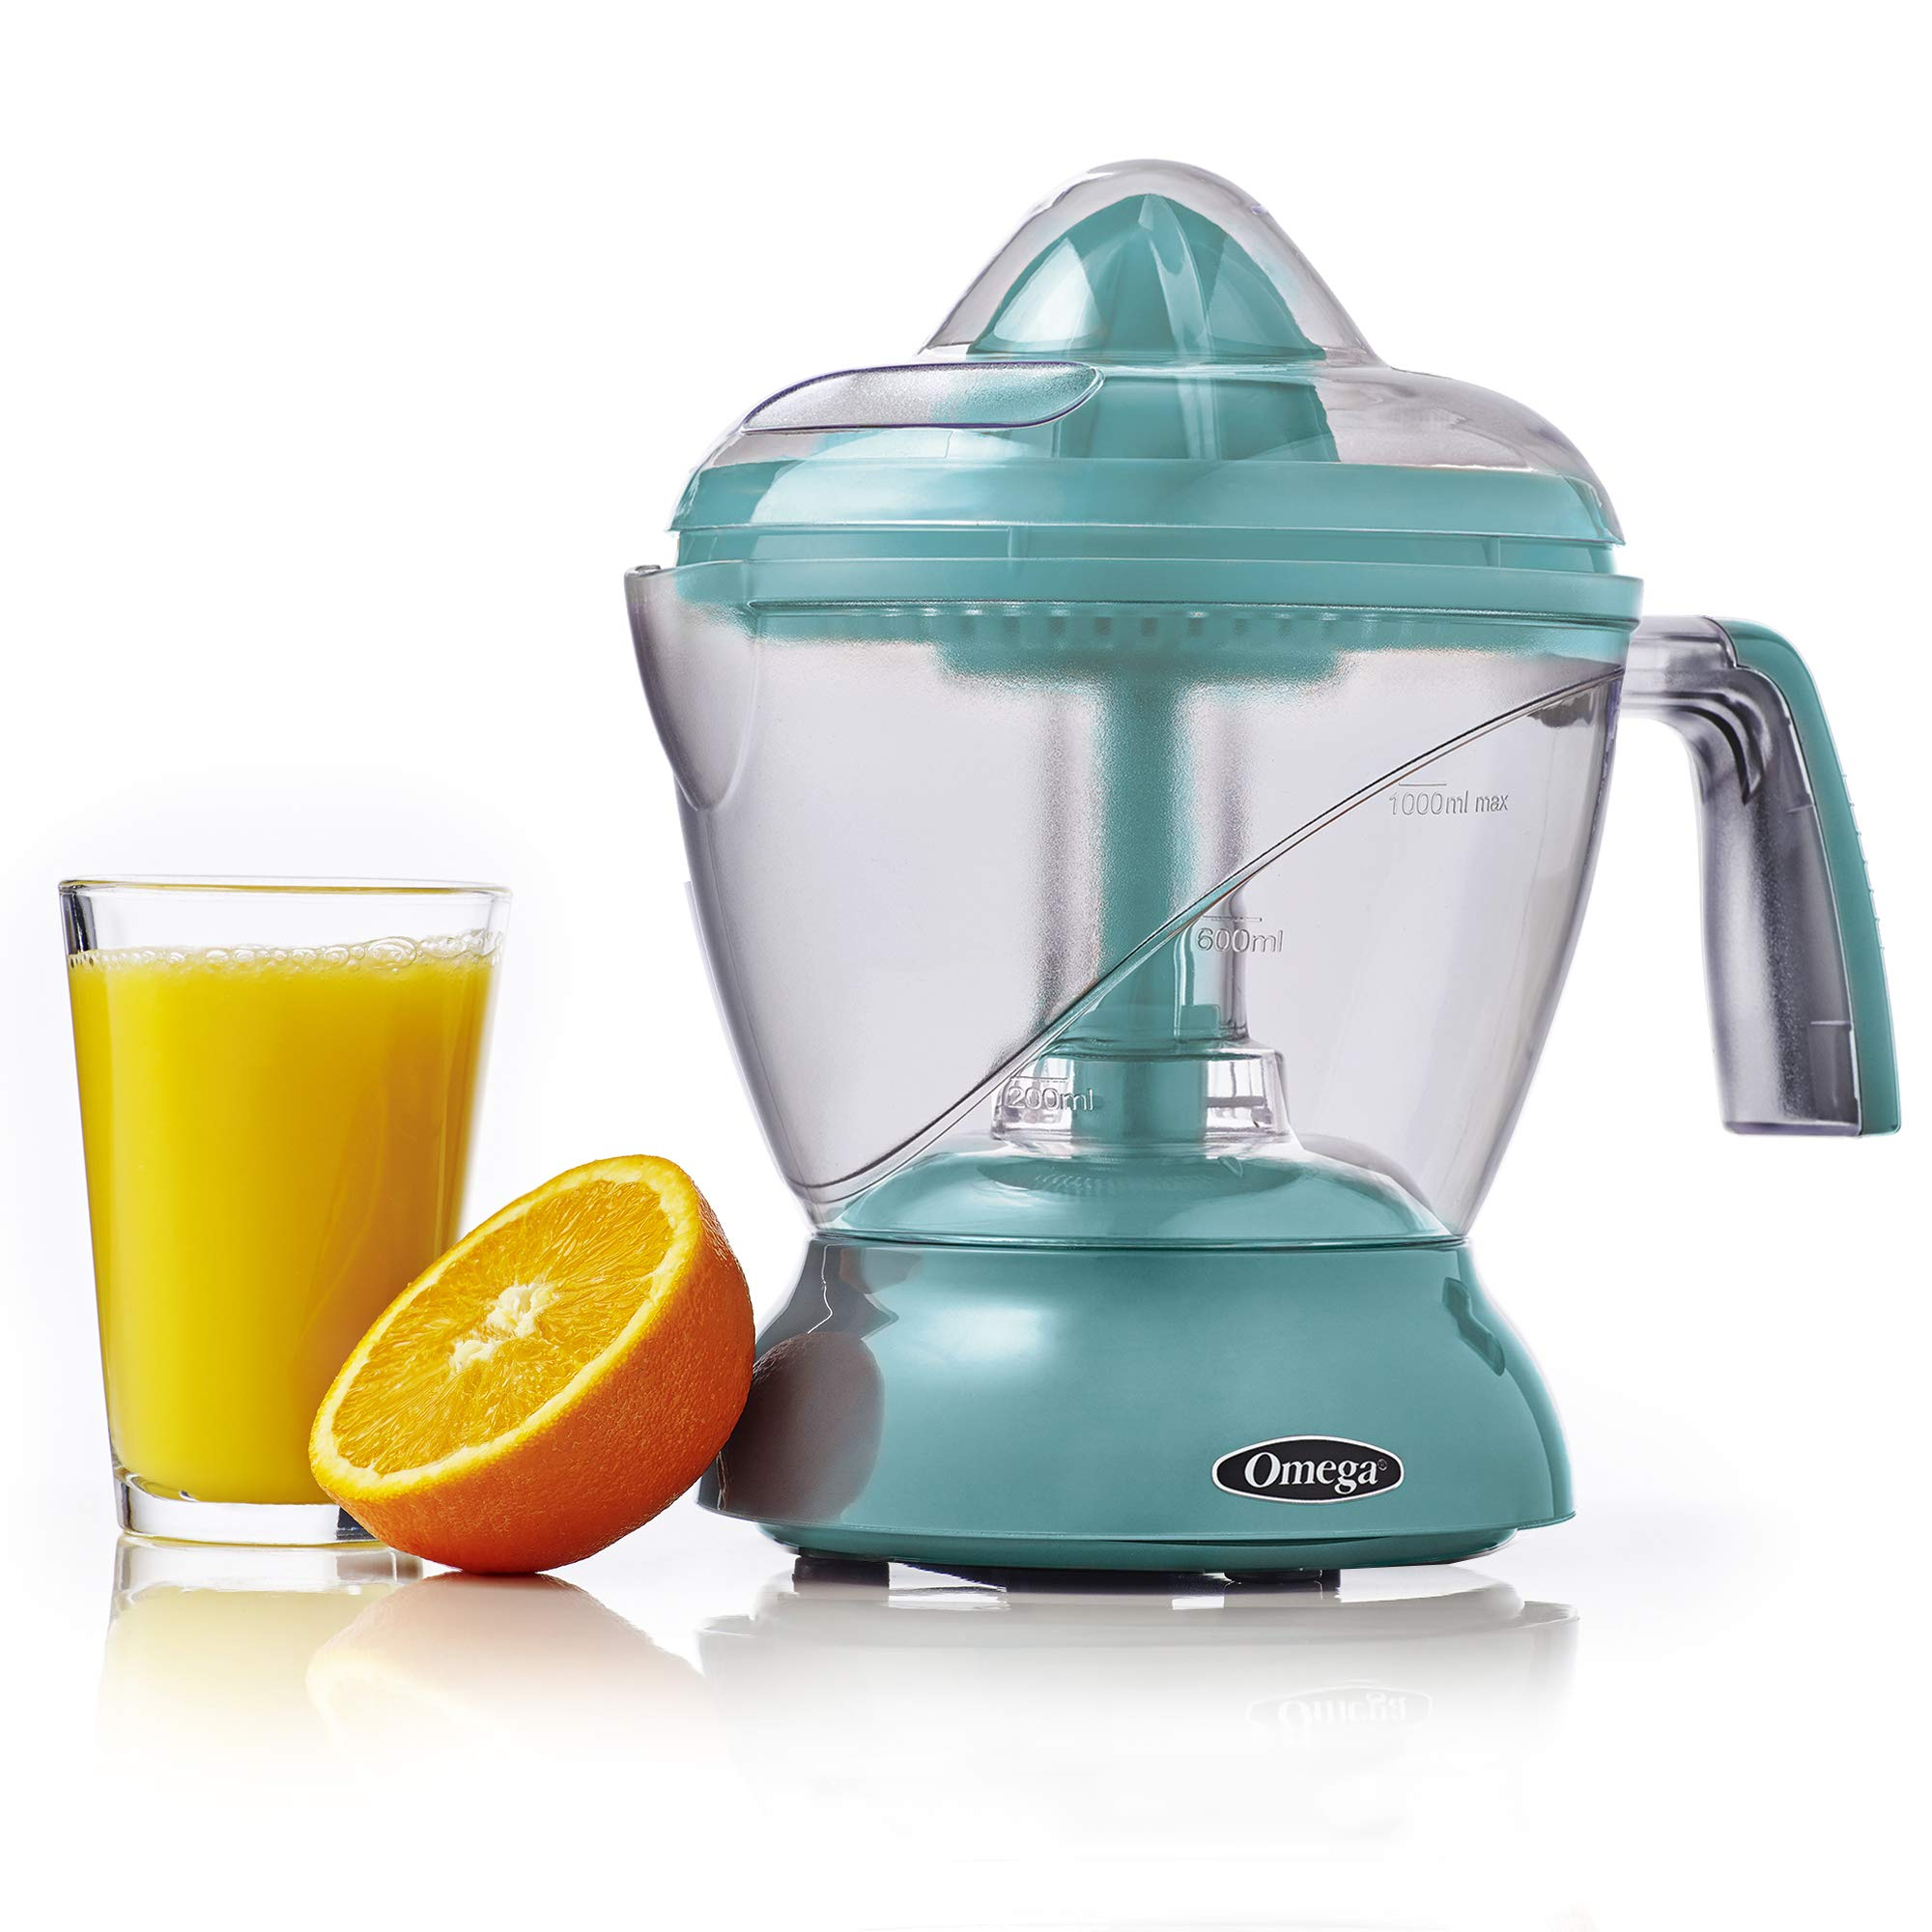 Omega CJ1000A 4-Cup Citrus Juicer, Blue